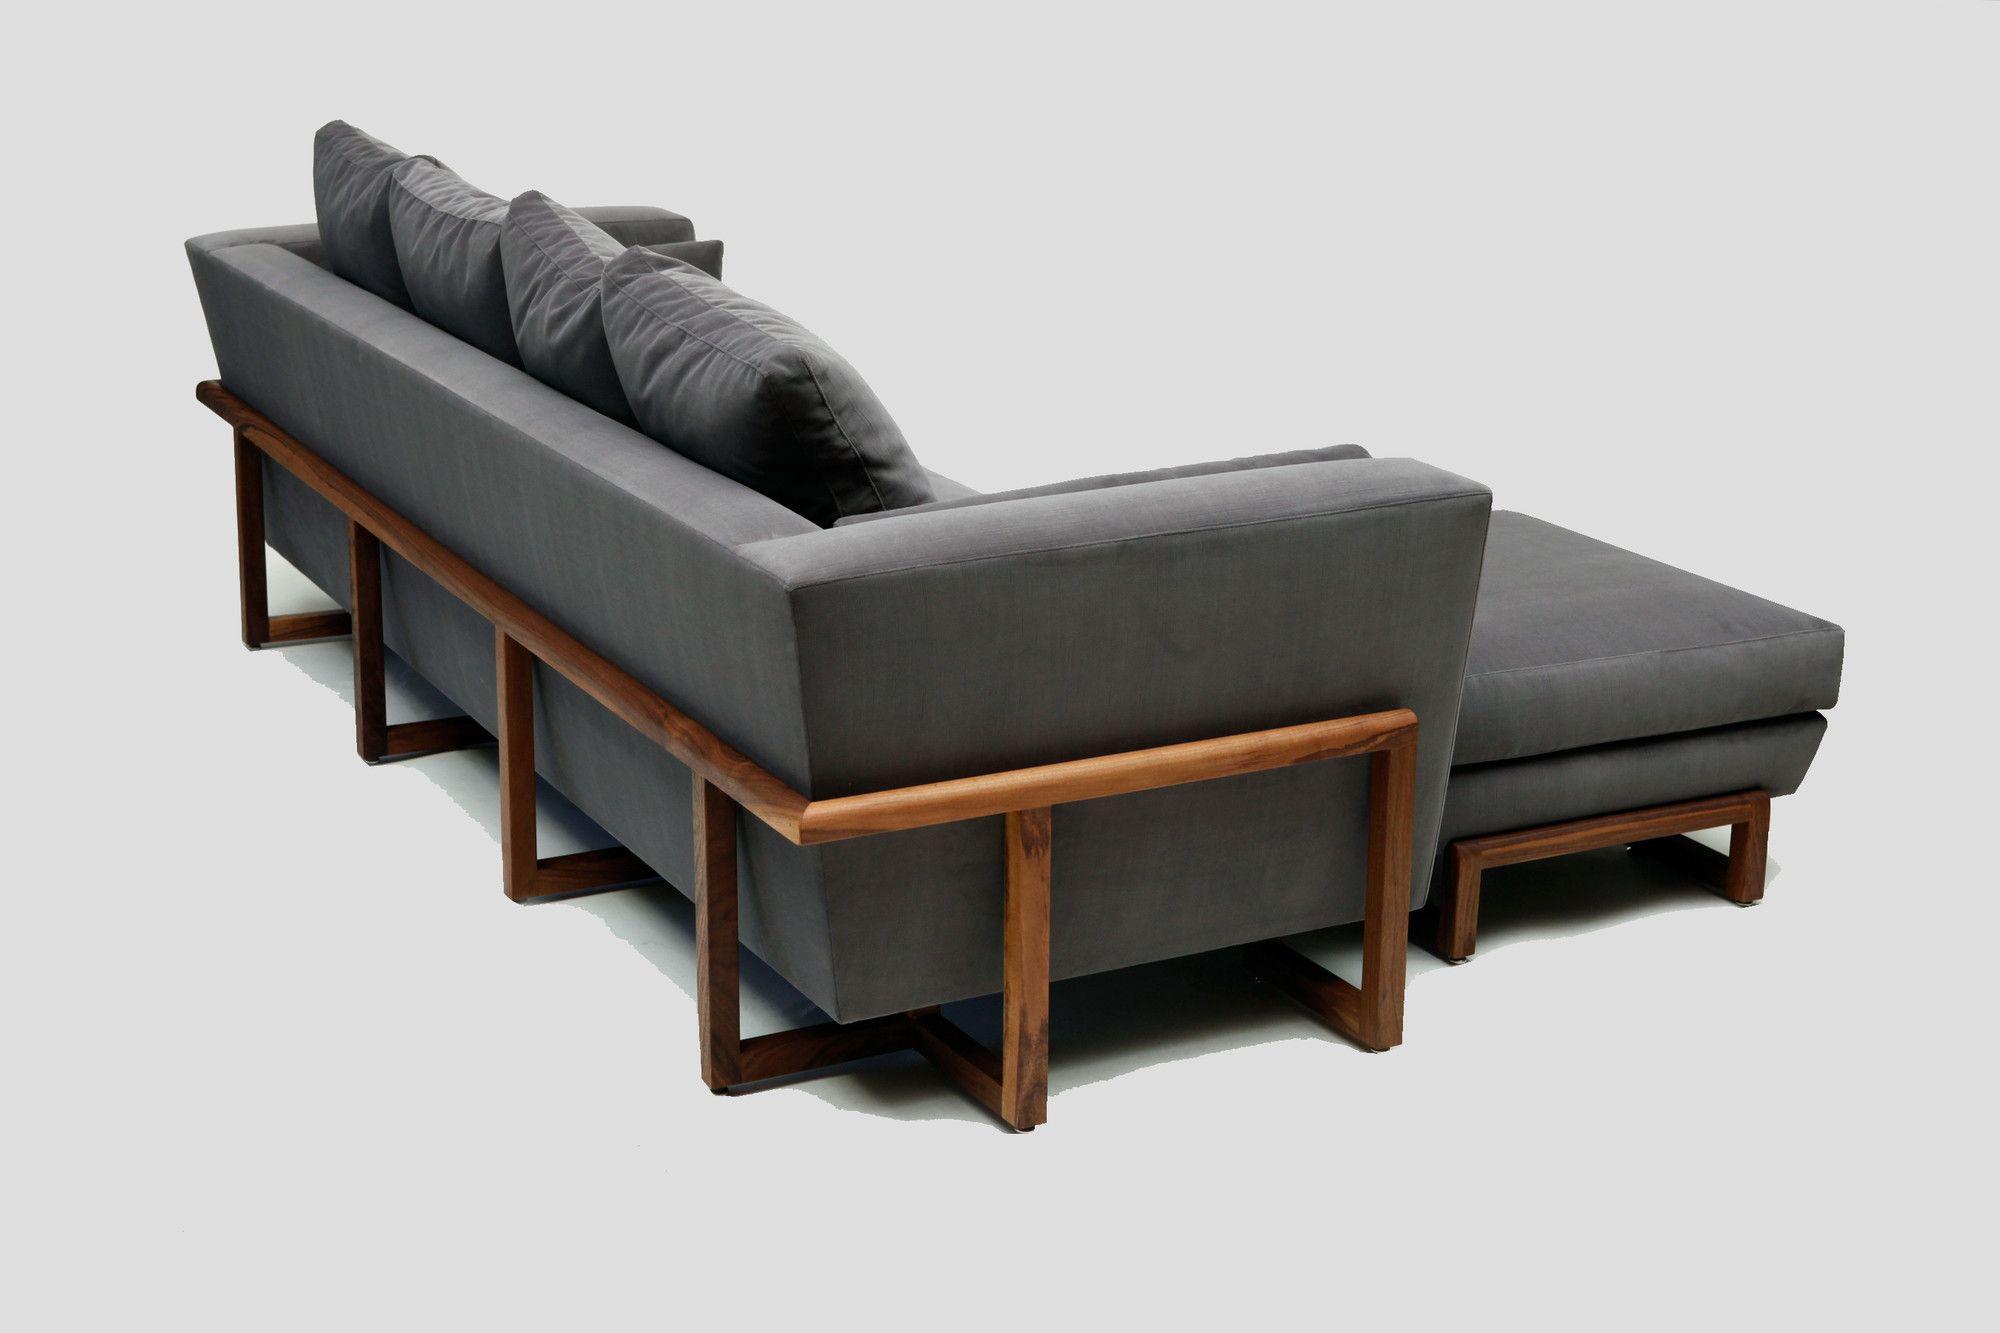 Artless lrg sofa and ottoman wayfair have a seat please